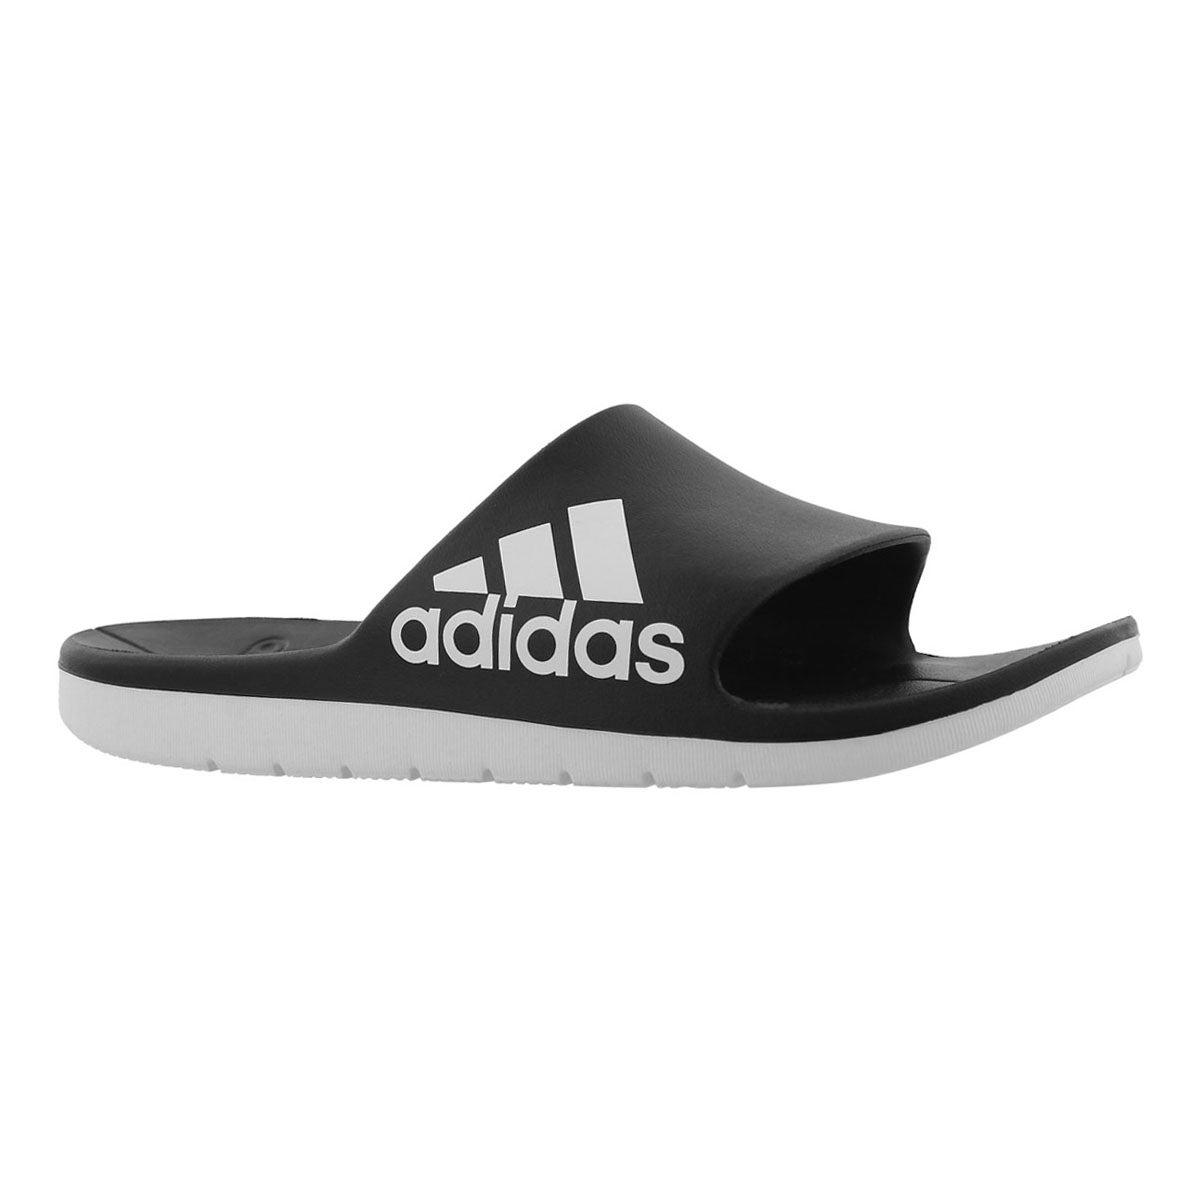 Mns Aqualette CF blk/wht slide sandal